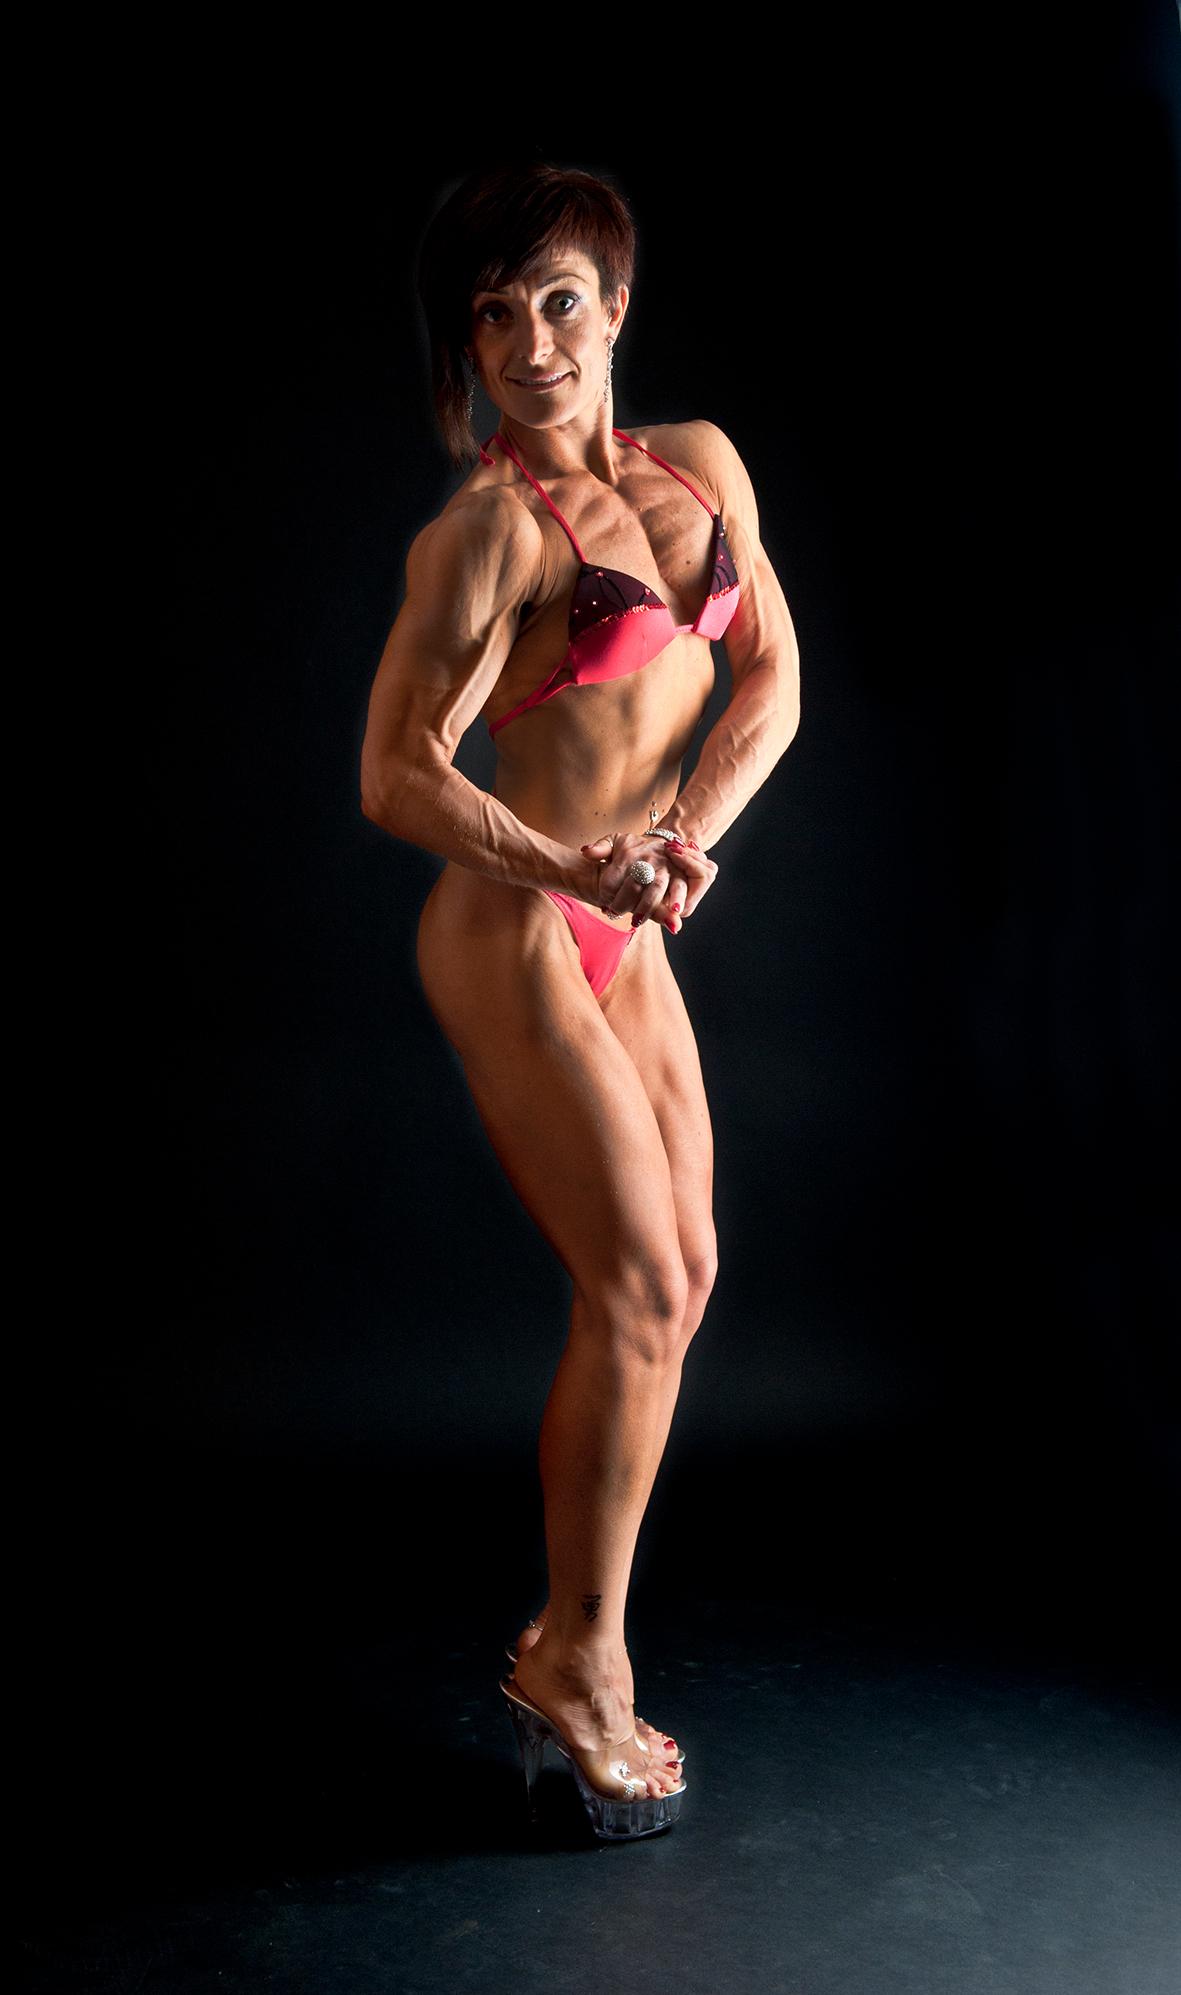 Allenarsi con una body builder – Roberta - Intervista